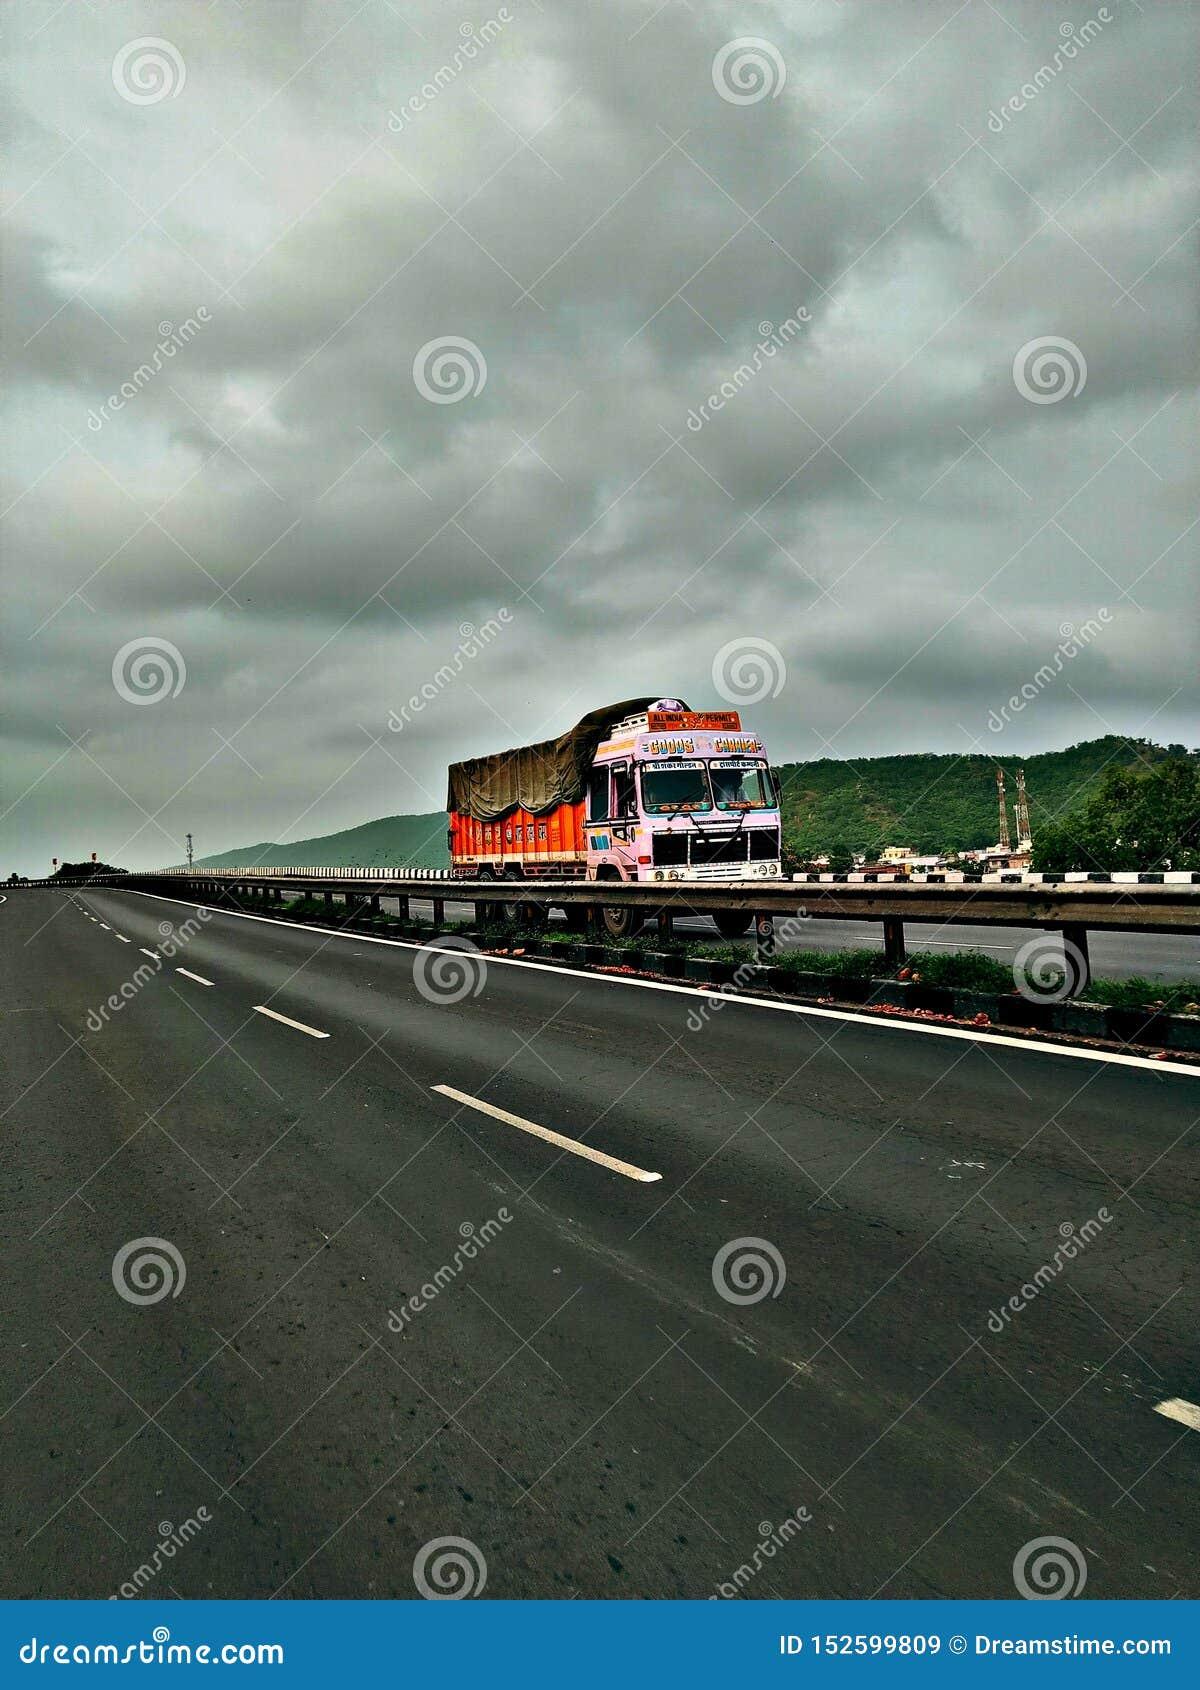 Truck lover on highways monsoon click